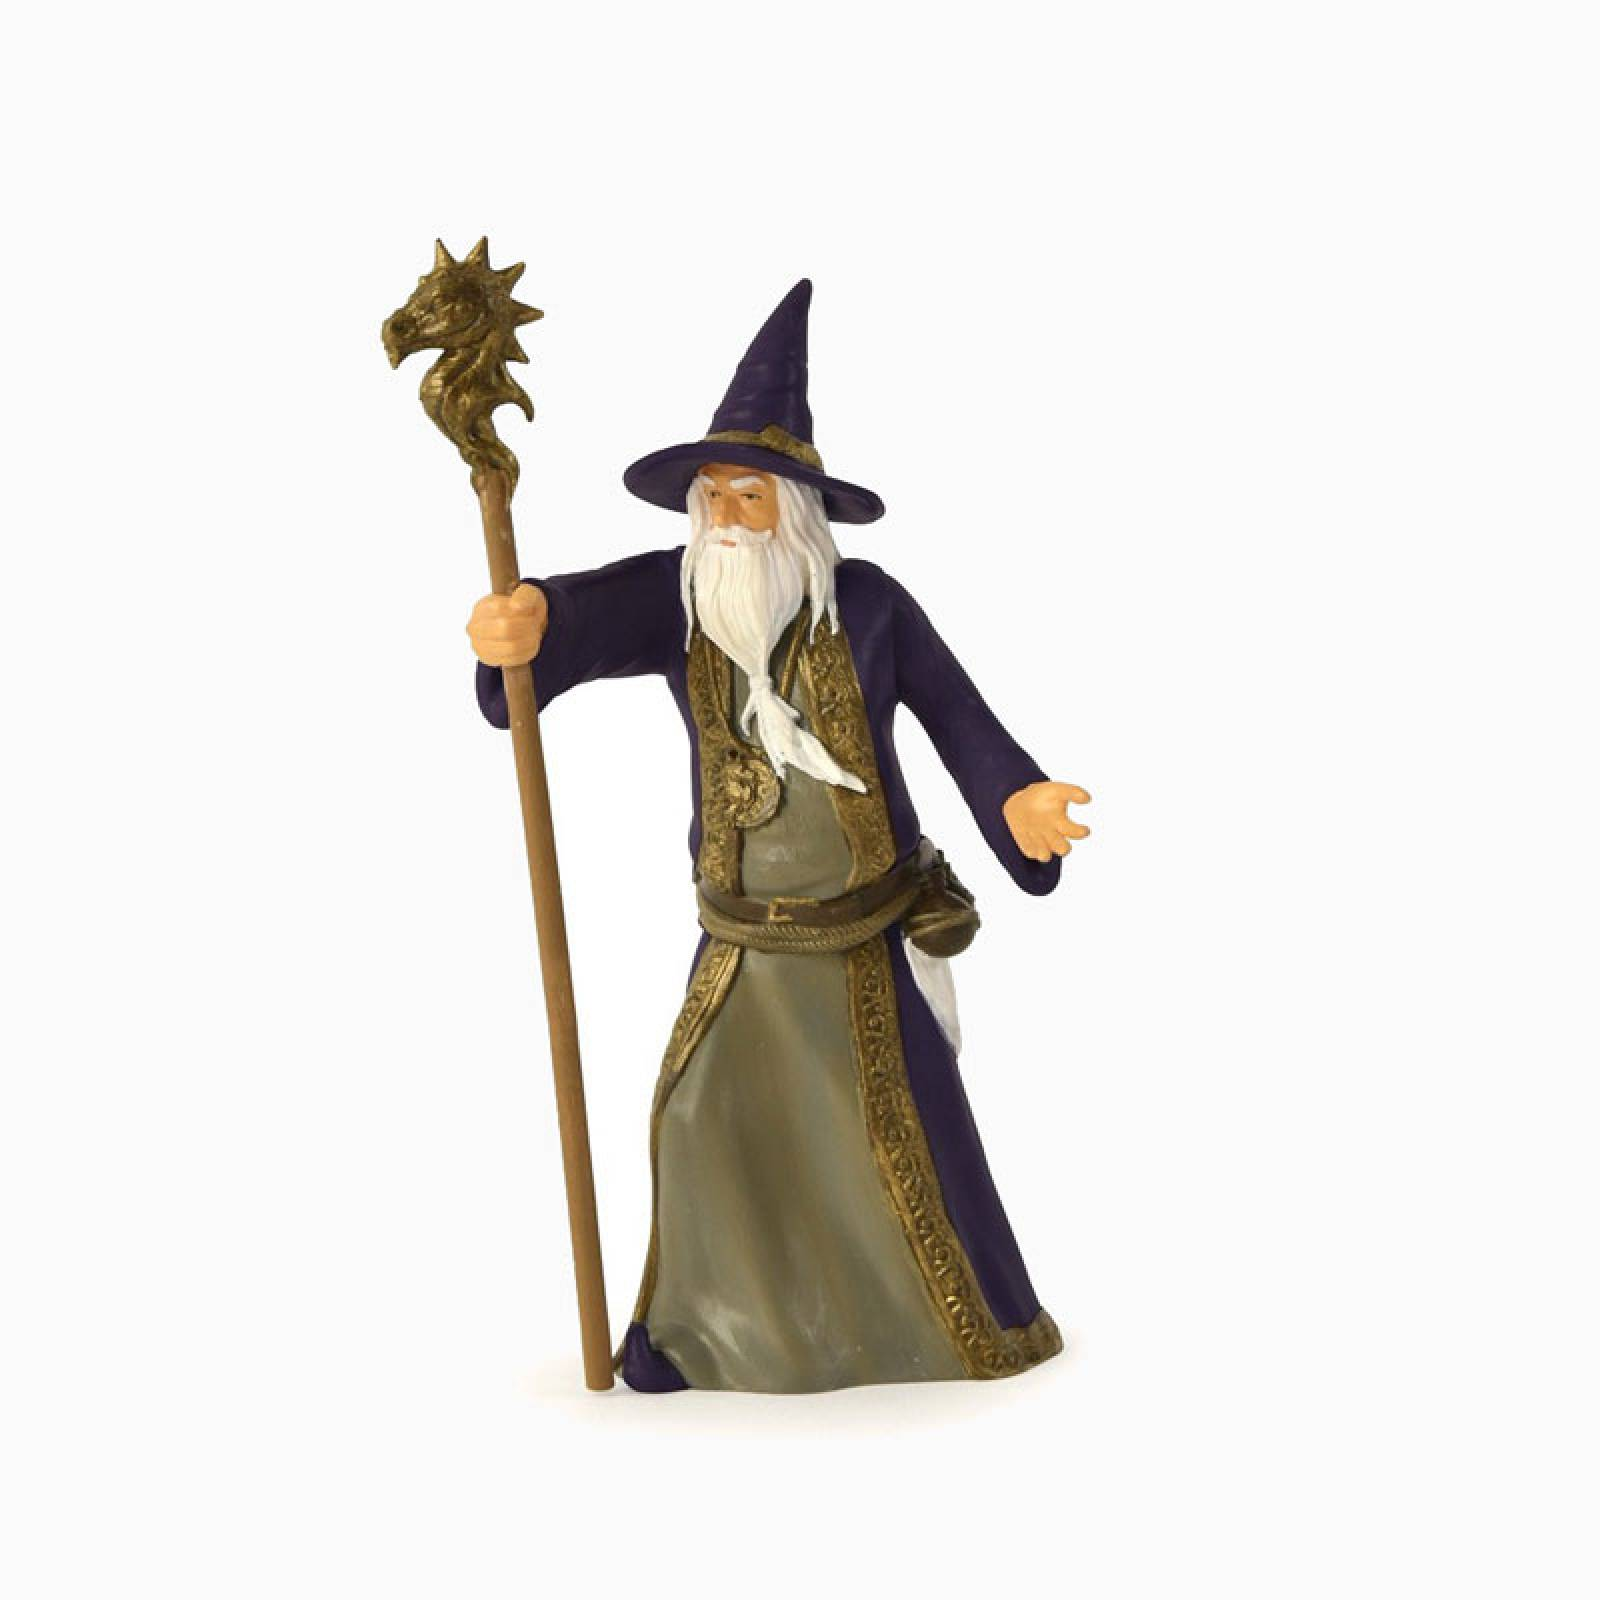 Sorcerer Magician - Papo Fantasy Figure